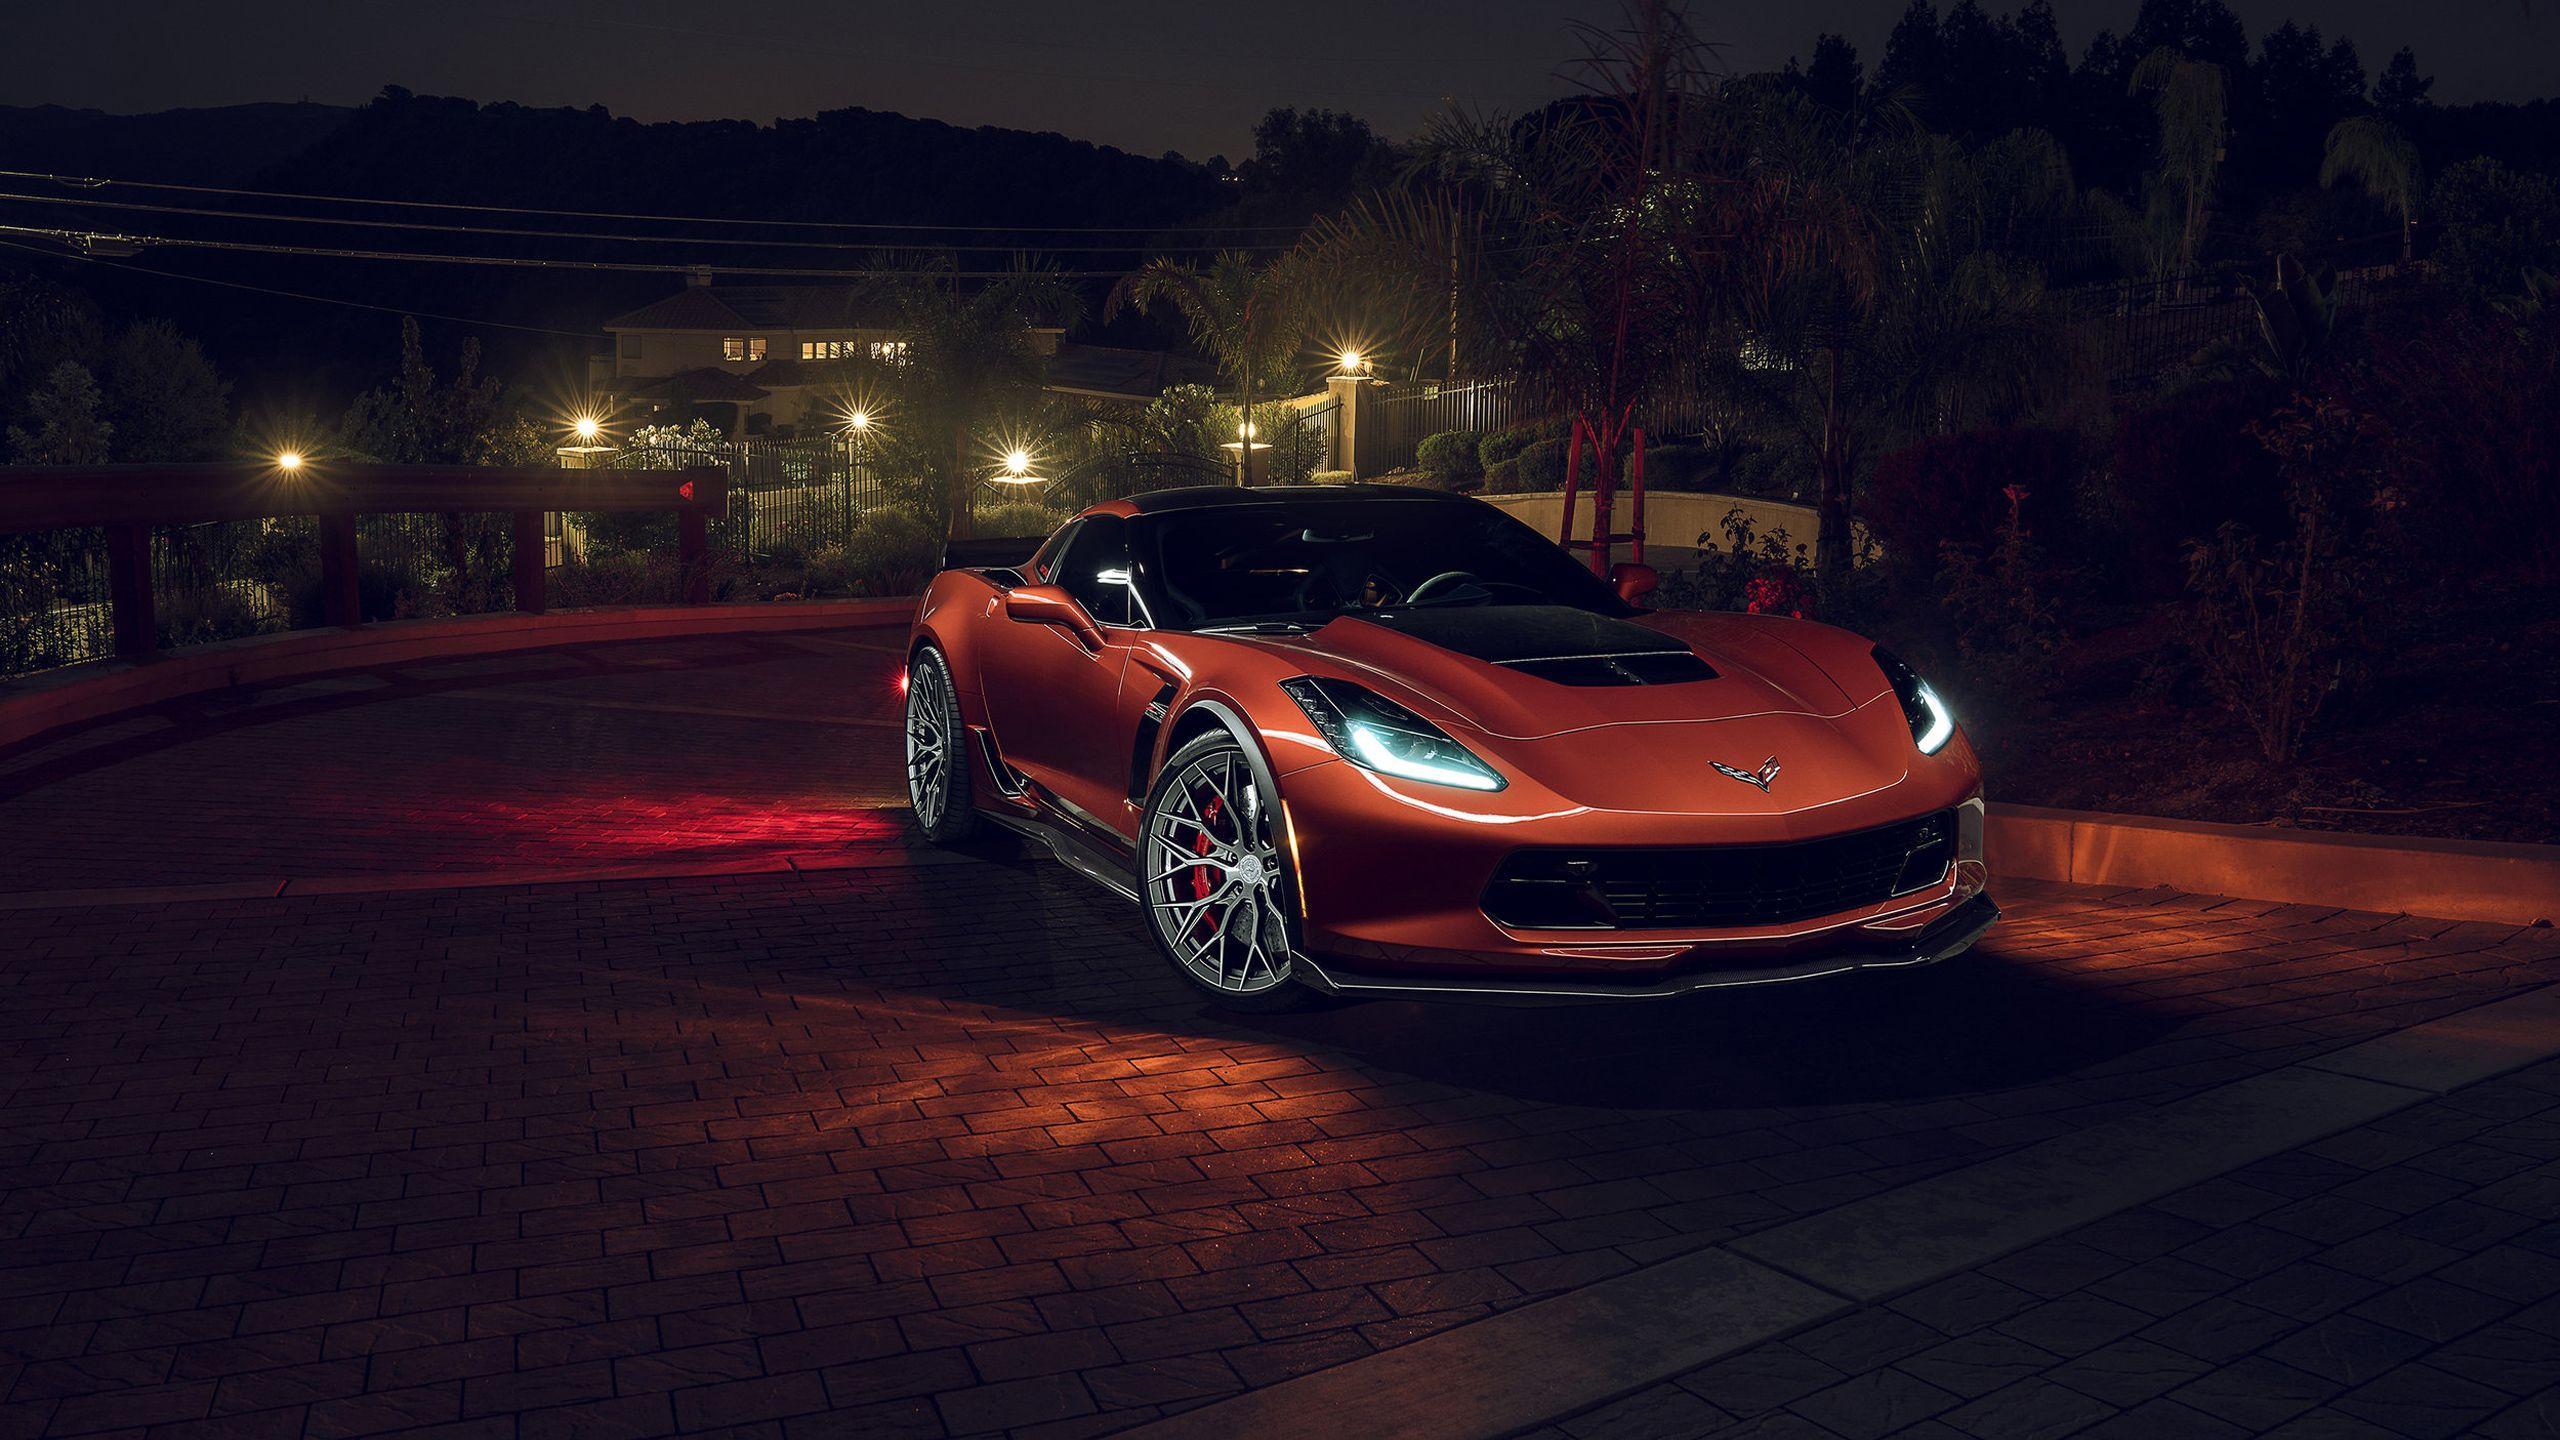 2018 Corvette Z06 Wallpapers Wallpaper Cave